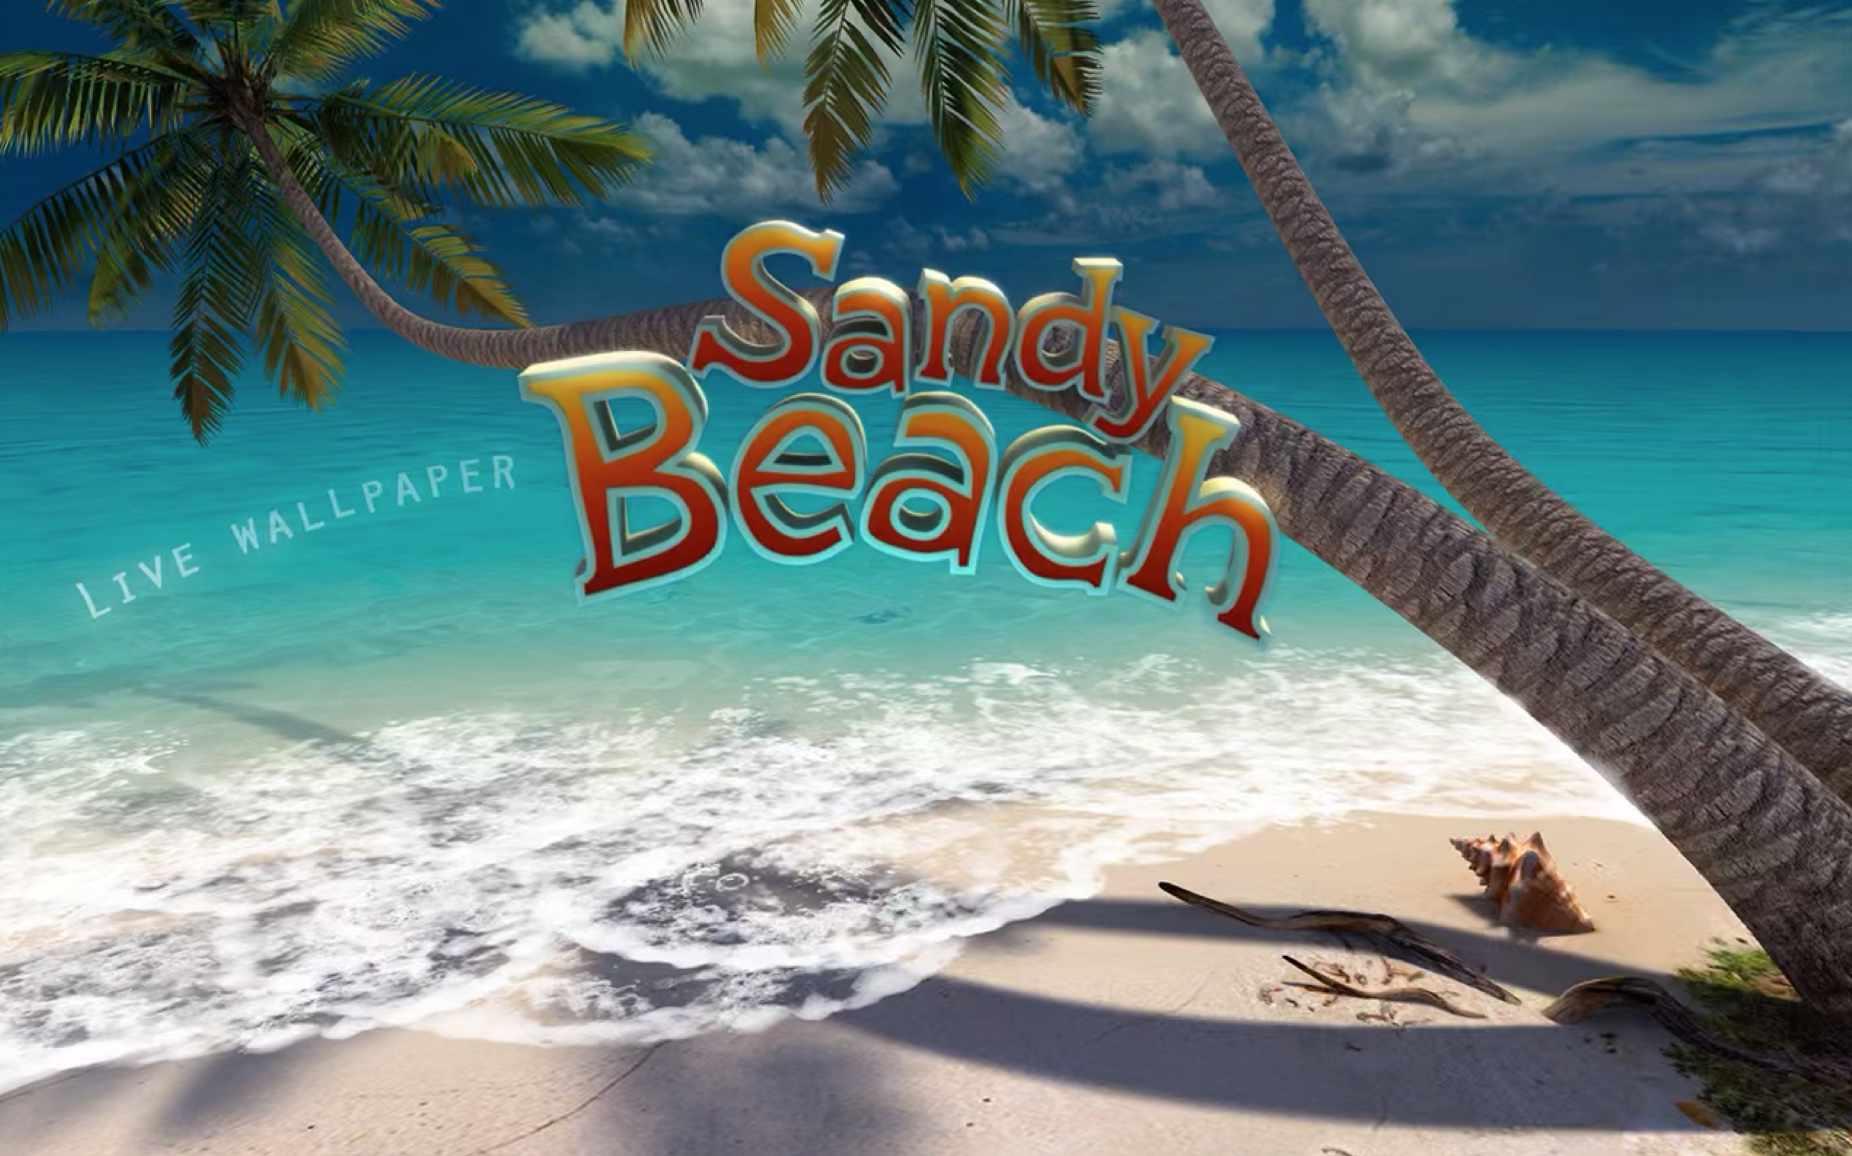 Sandy Beach live wallpaper for Mac